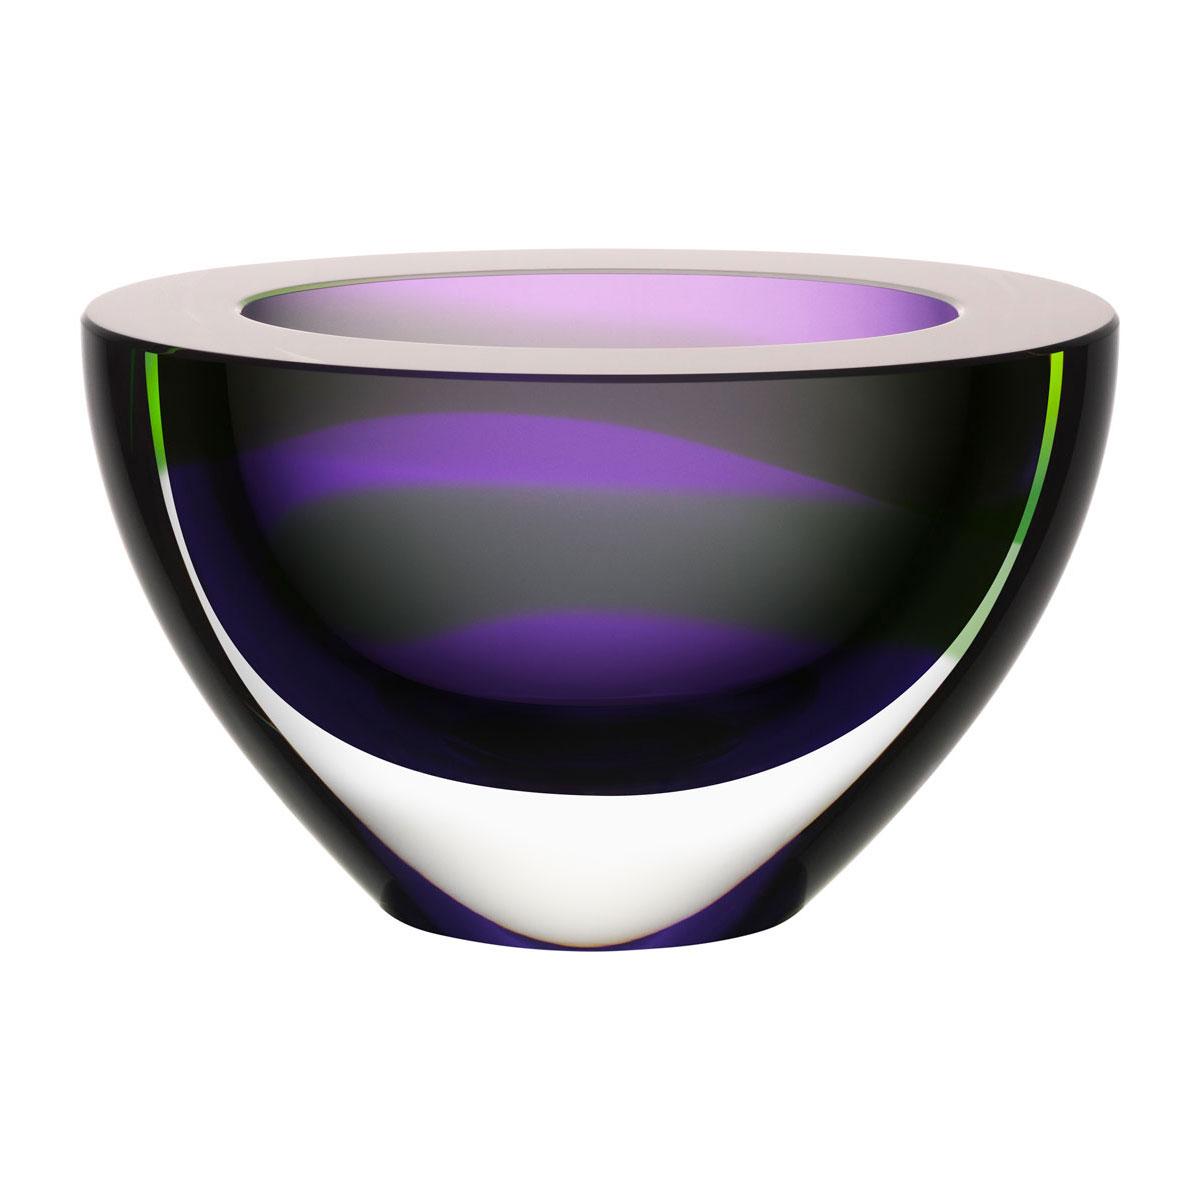 Kosta Boda Art Glass, Ludvig Lofgren Oval Crystal Bowl Purple, Limited Edition